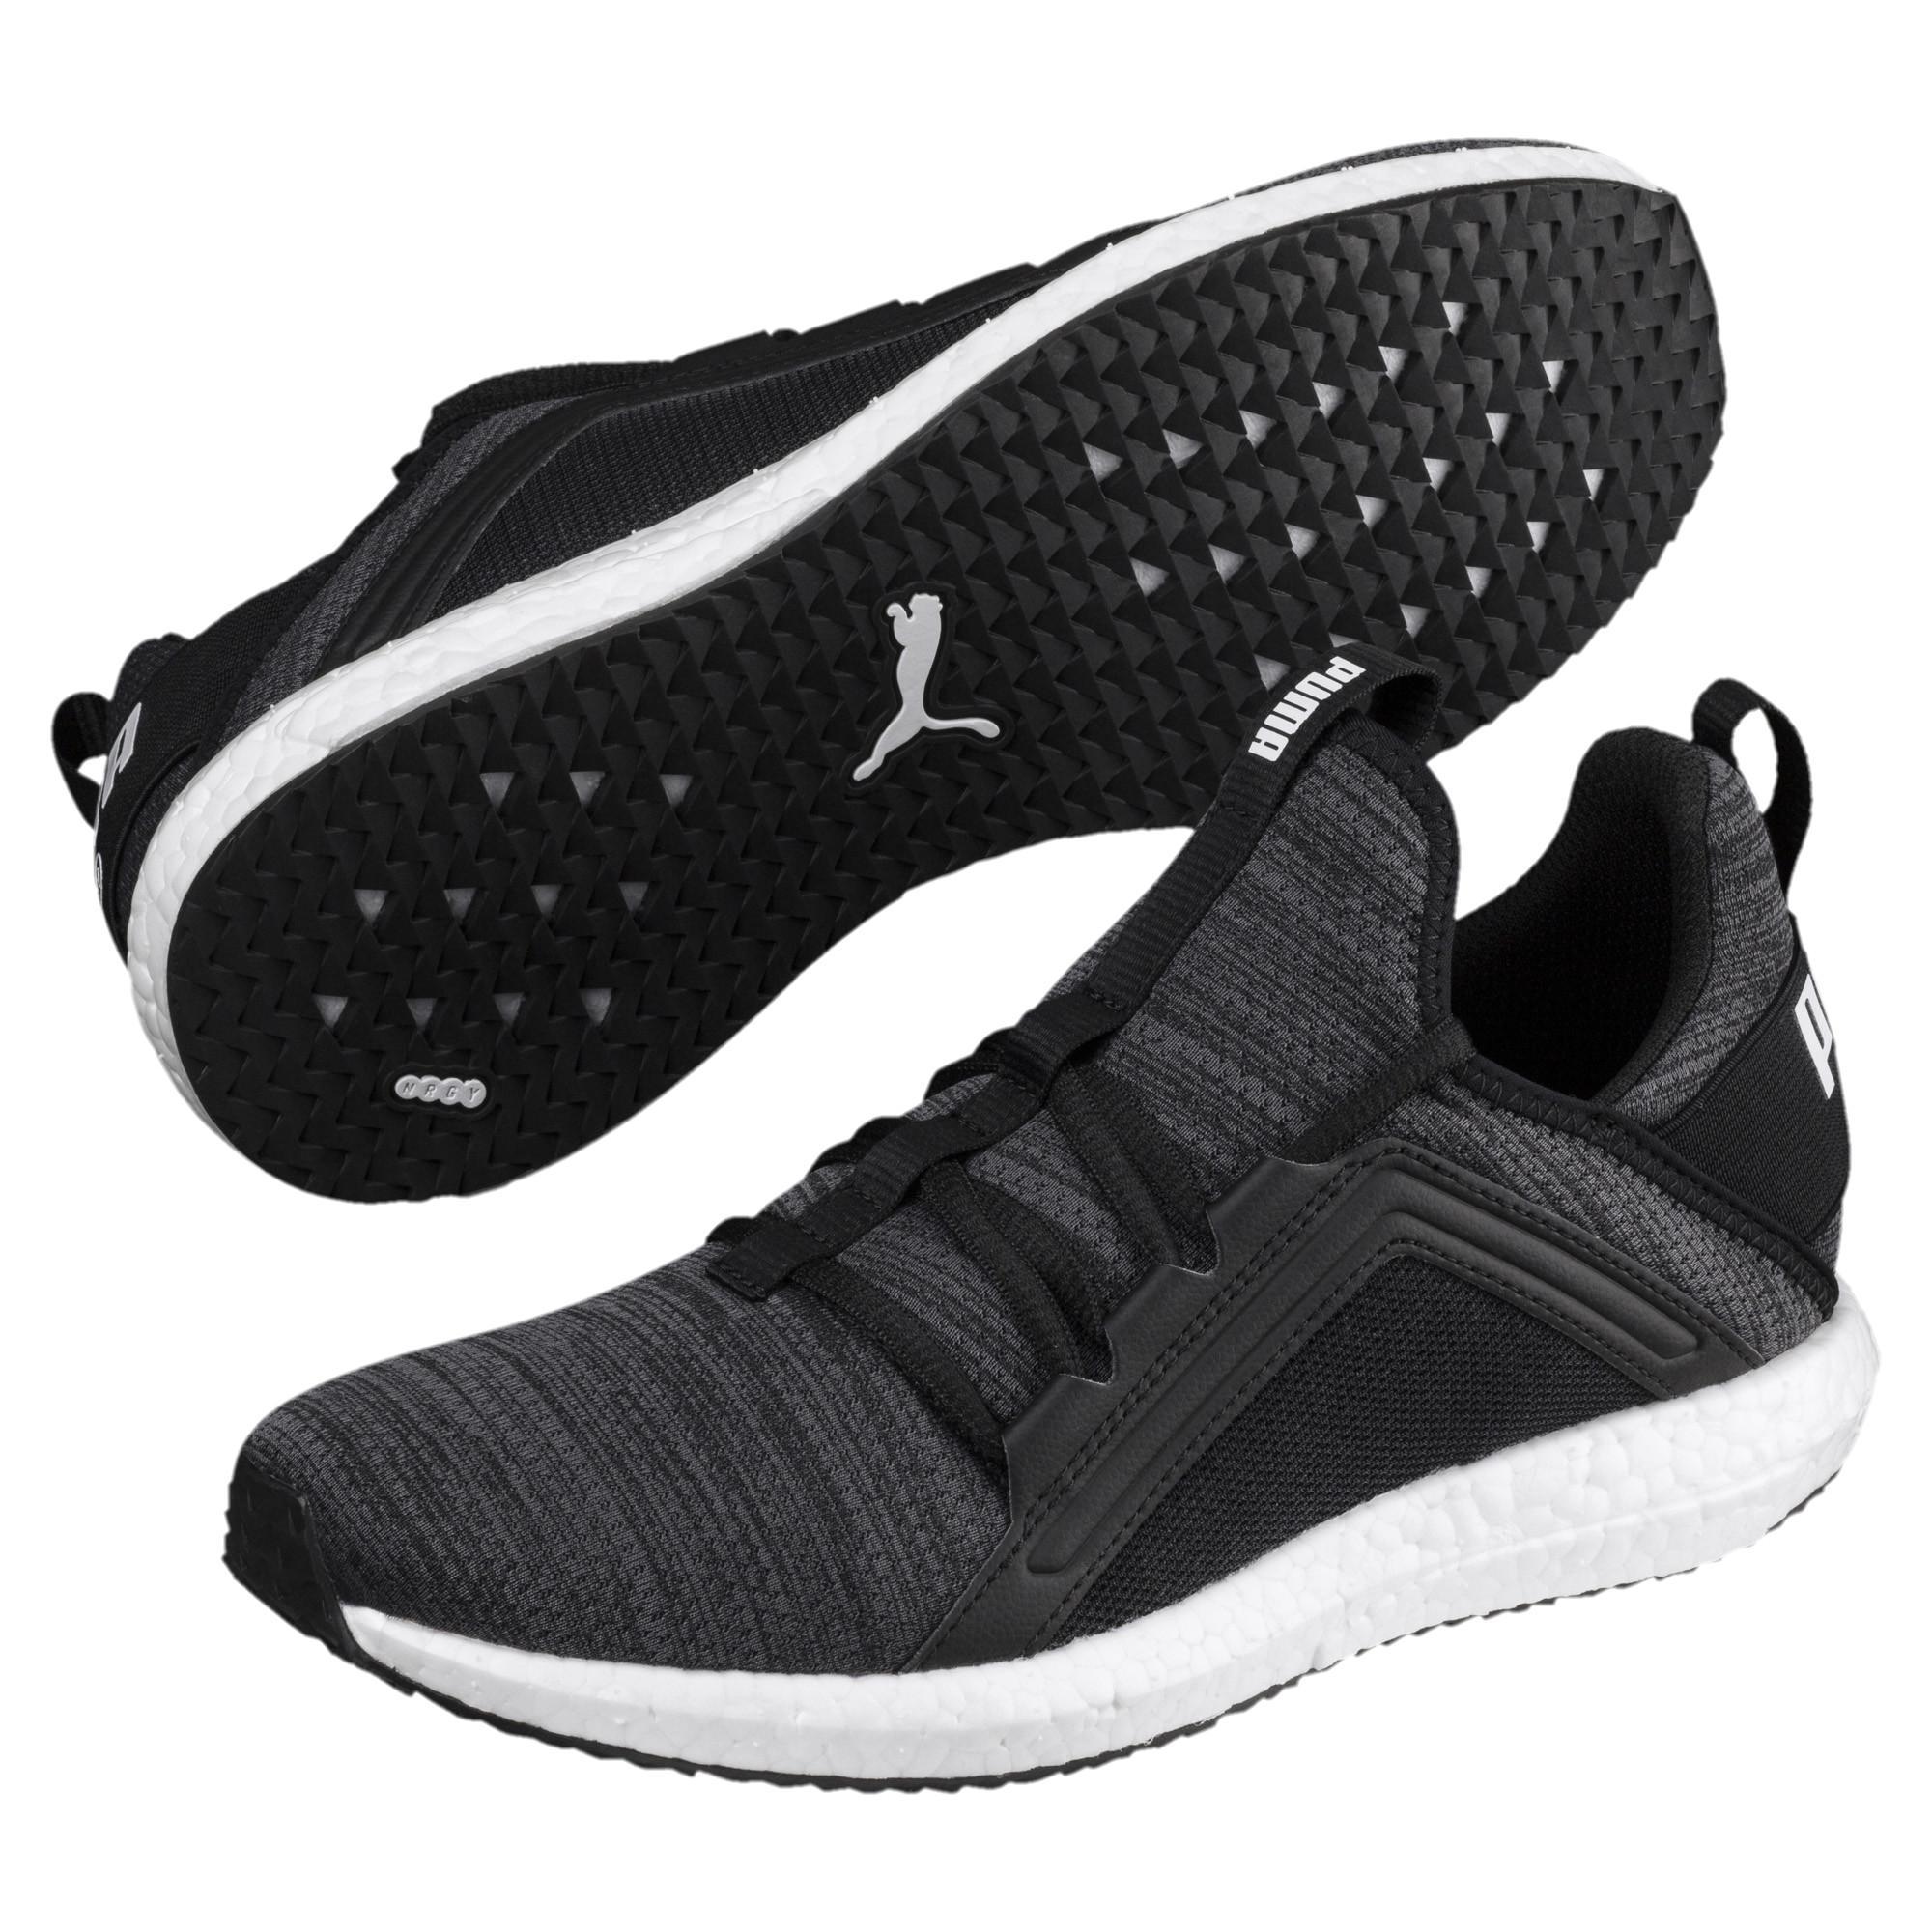 710a52cbd2edb6 PUMA - Black Mega Nrgy Heather Knit Women s Running Shoes - Lyst. View  fullscreen